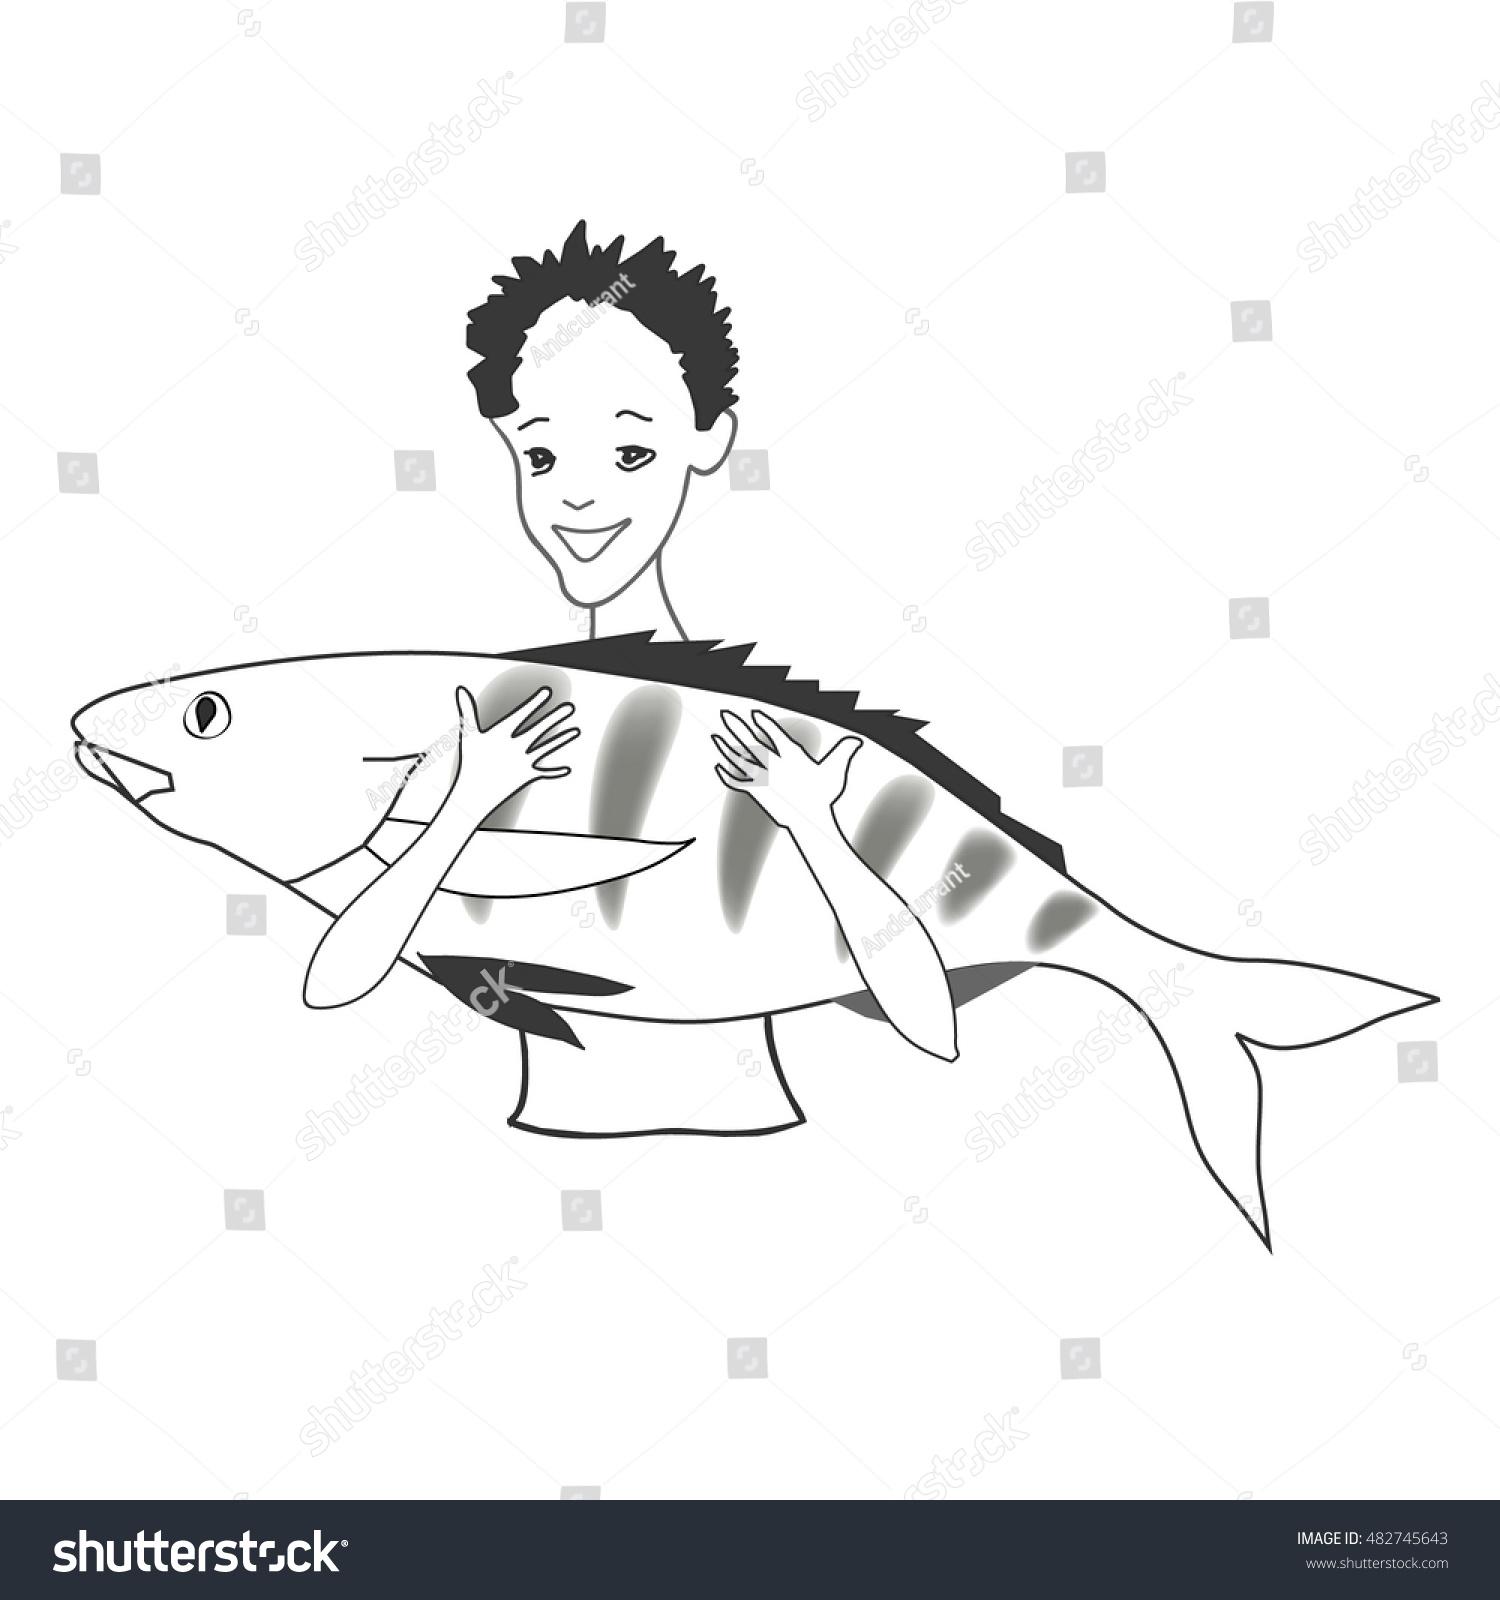 Black Cheerleader Fishing-pic6902